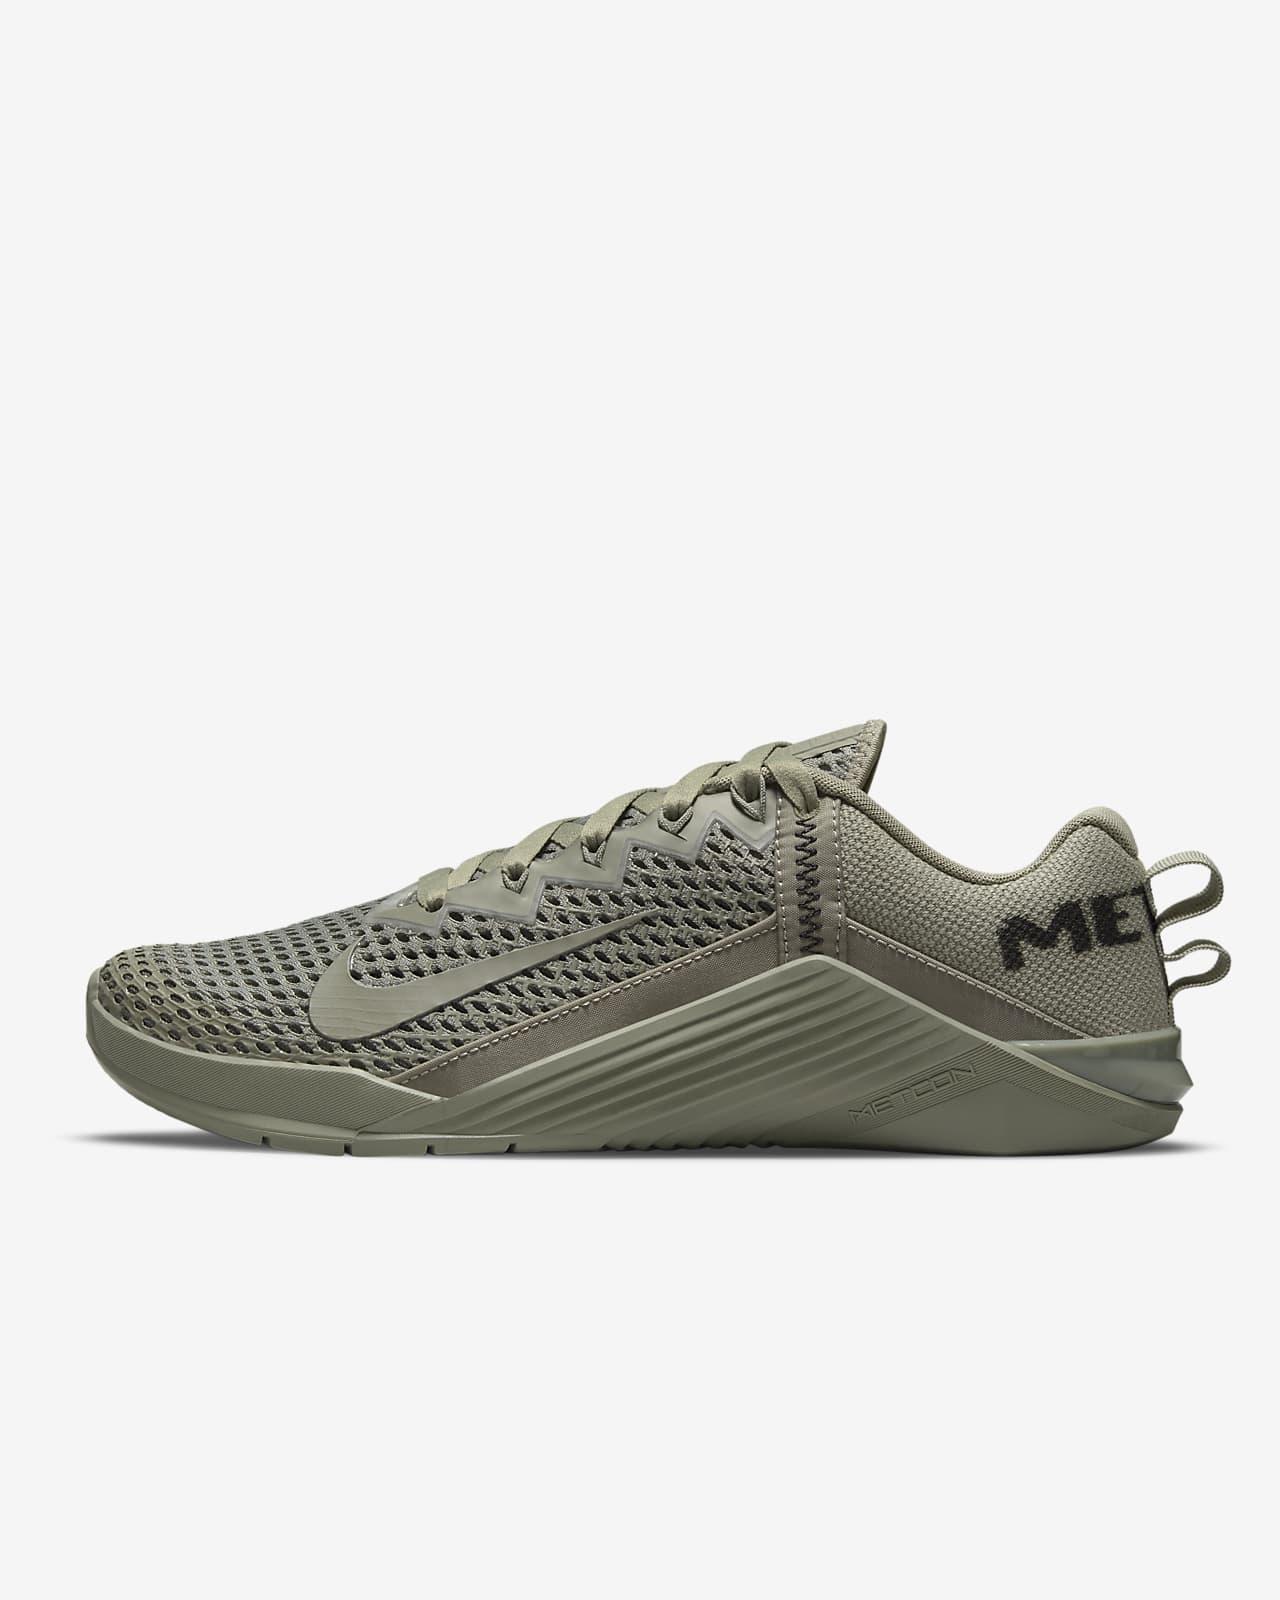 Chaussure de training Nike Metcon 6 AMP